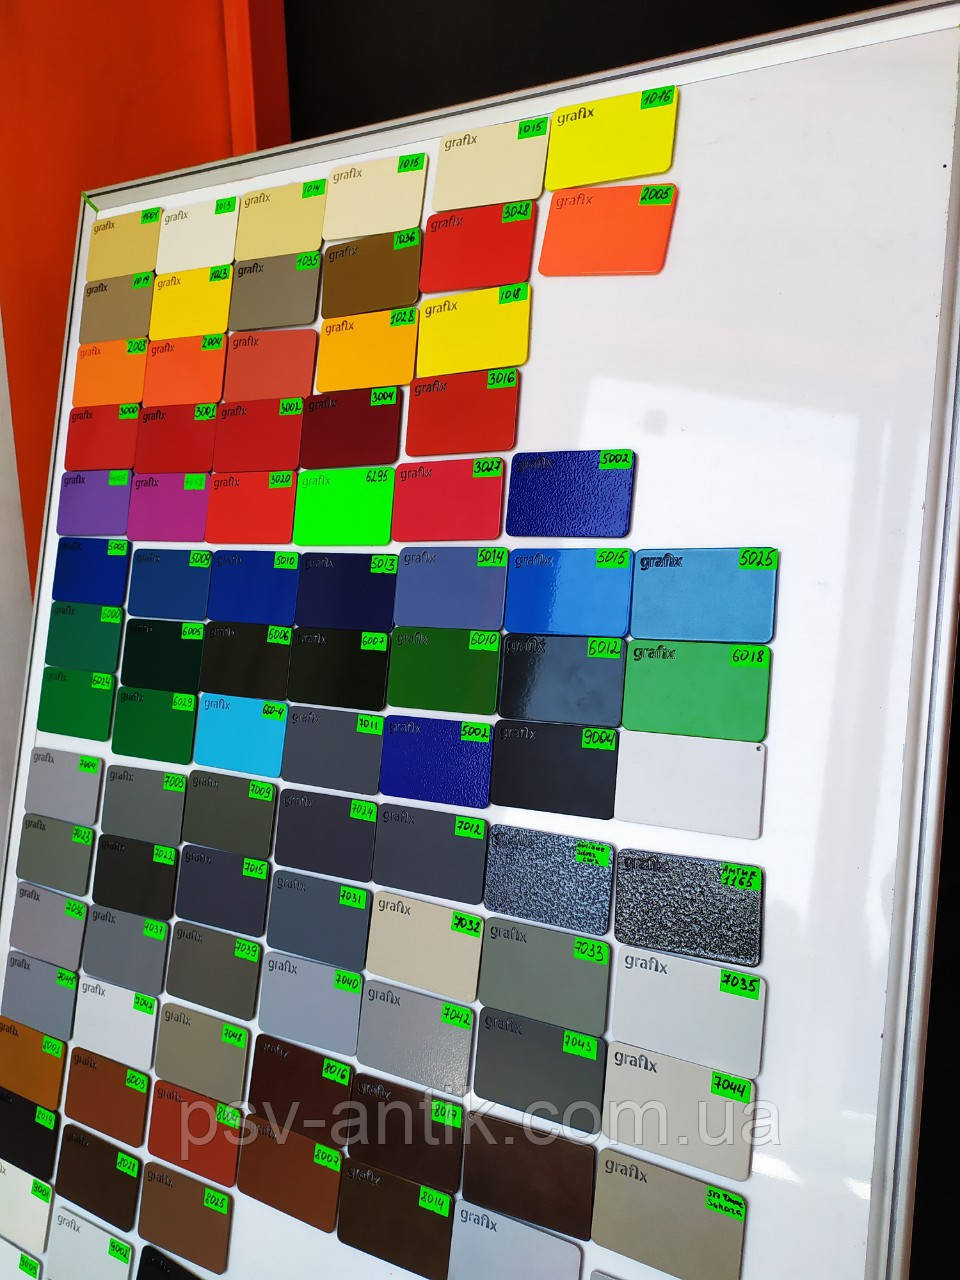 Порошковая краска глянцевая, полиэфирная, архитектурная, 2010